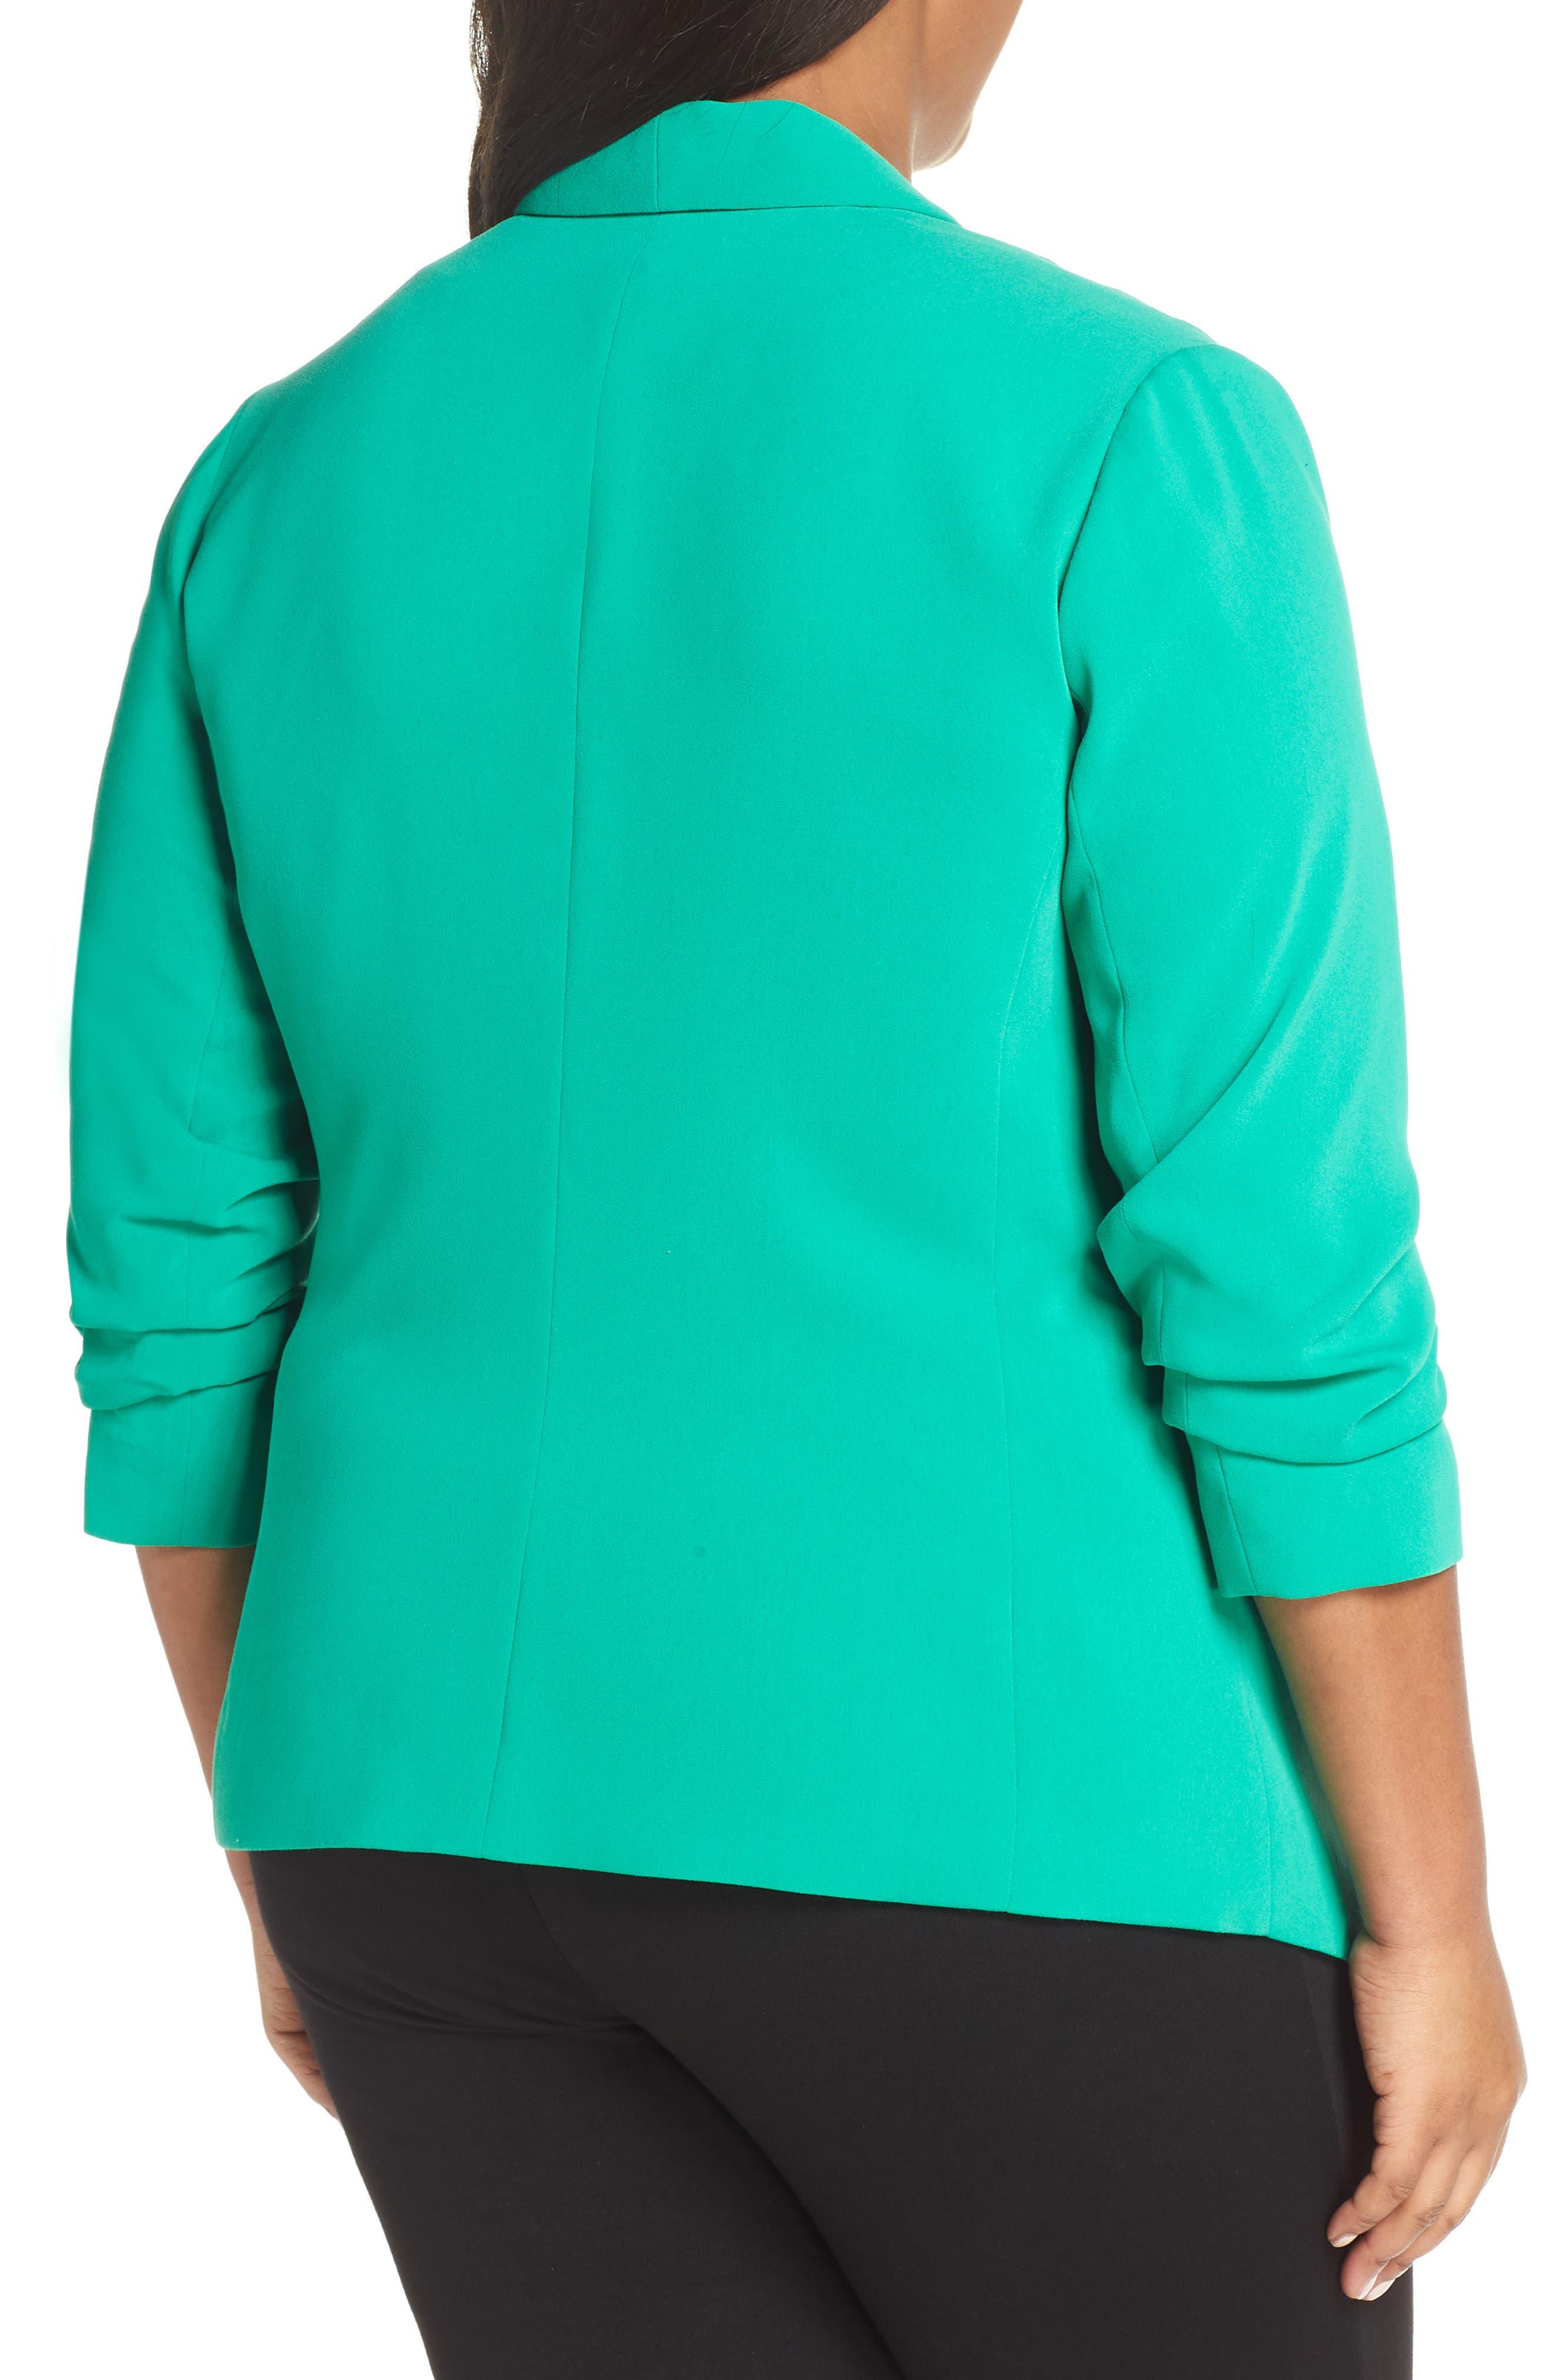 SEJOUR, Gathered Sleeve Blazer, Alternate thumbnail 2, color, GREEN PARAKEET